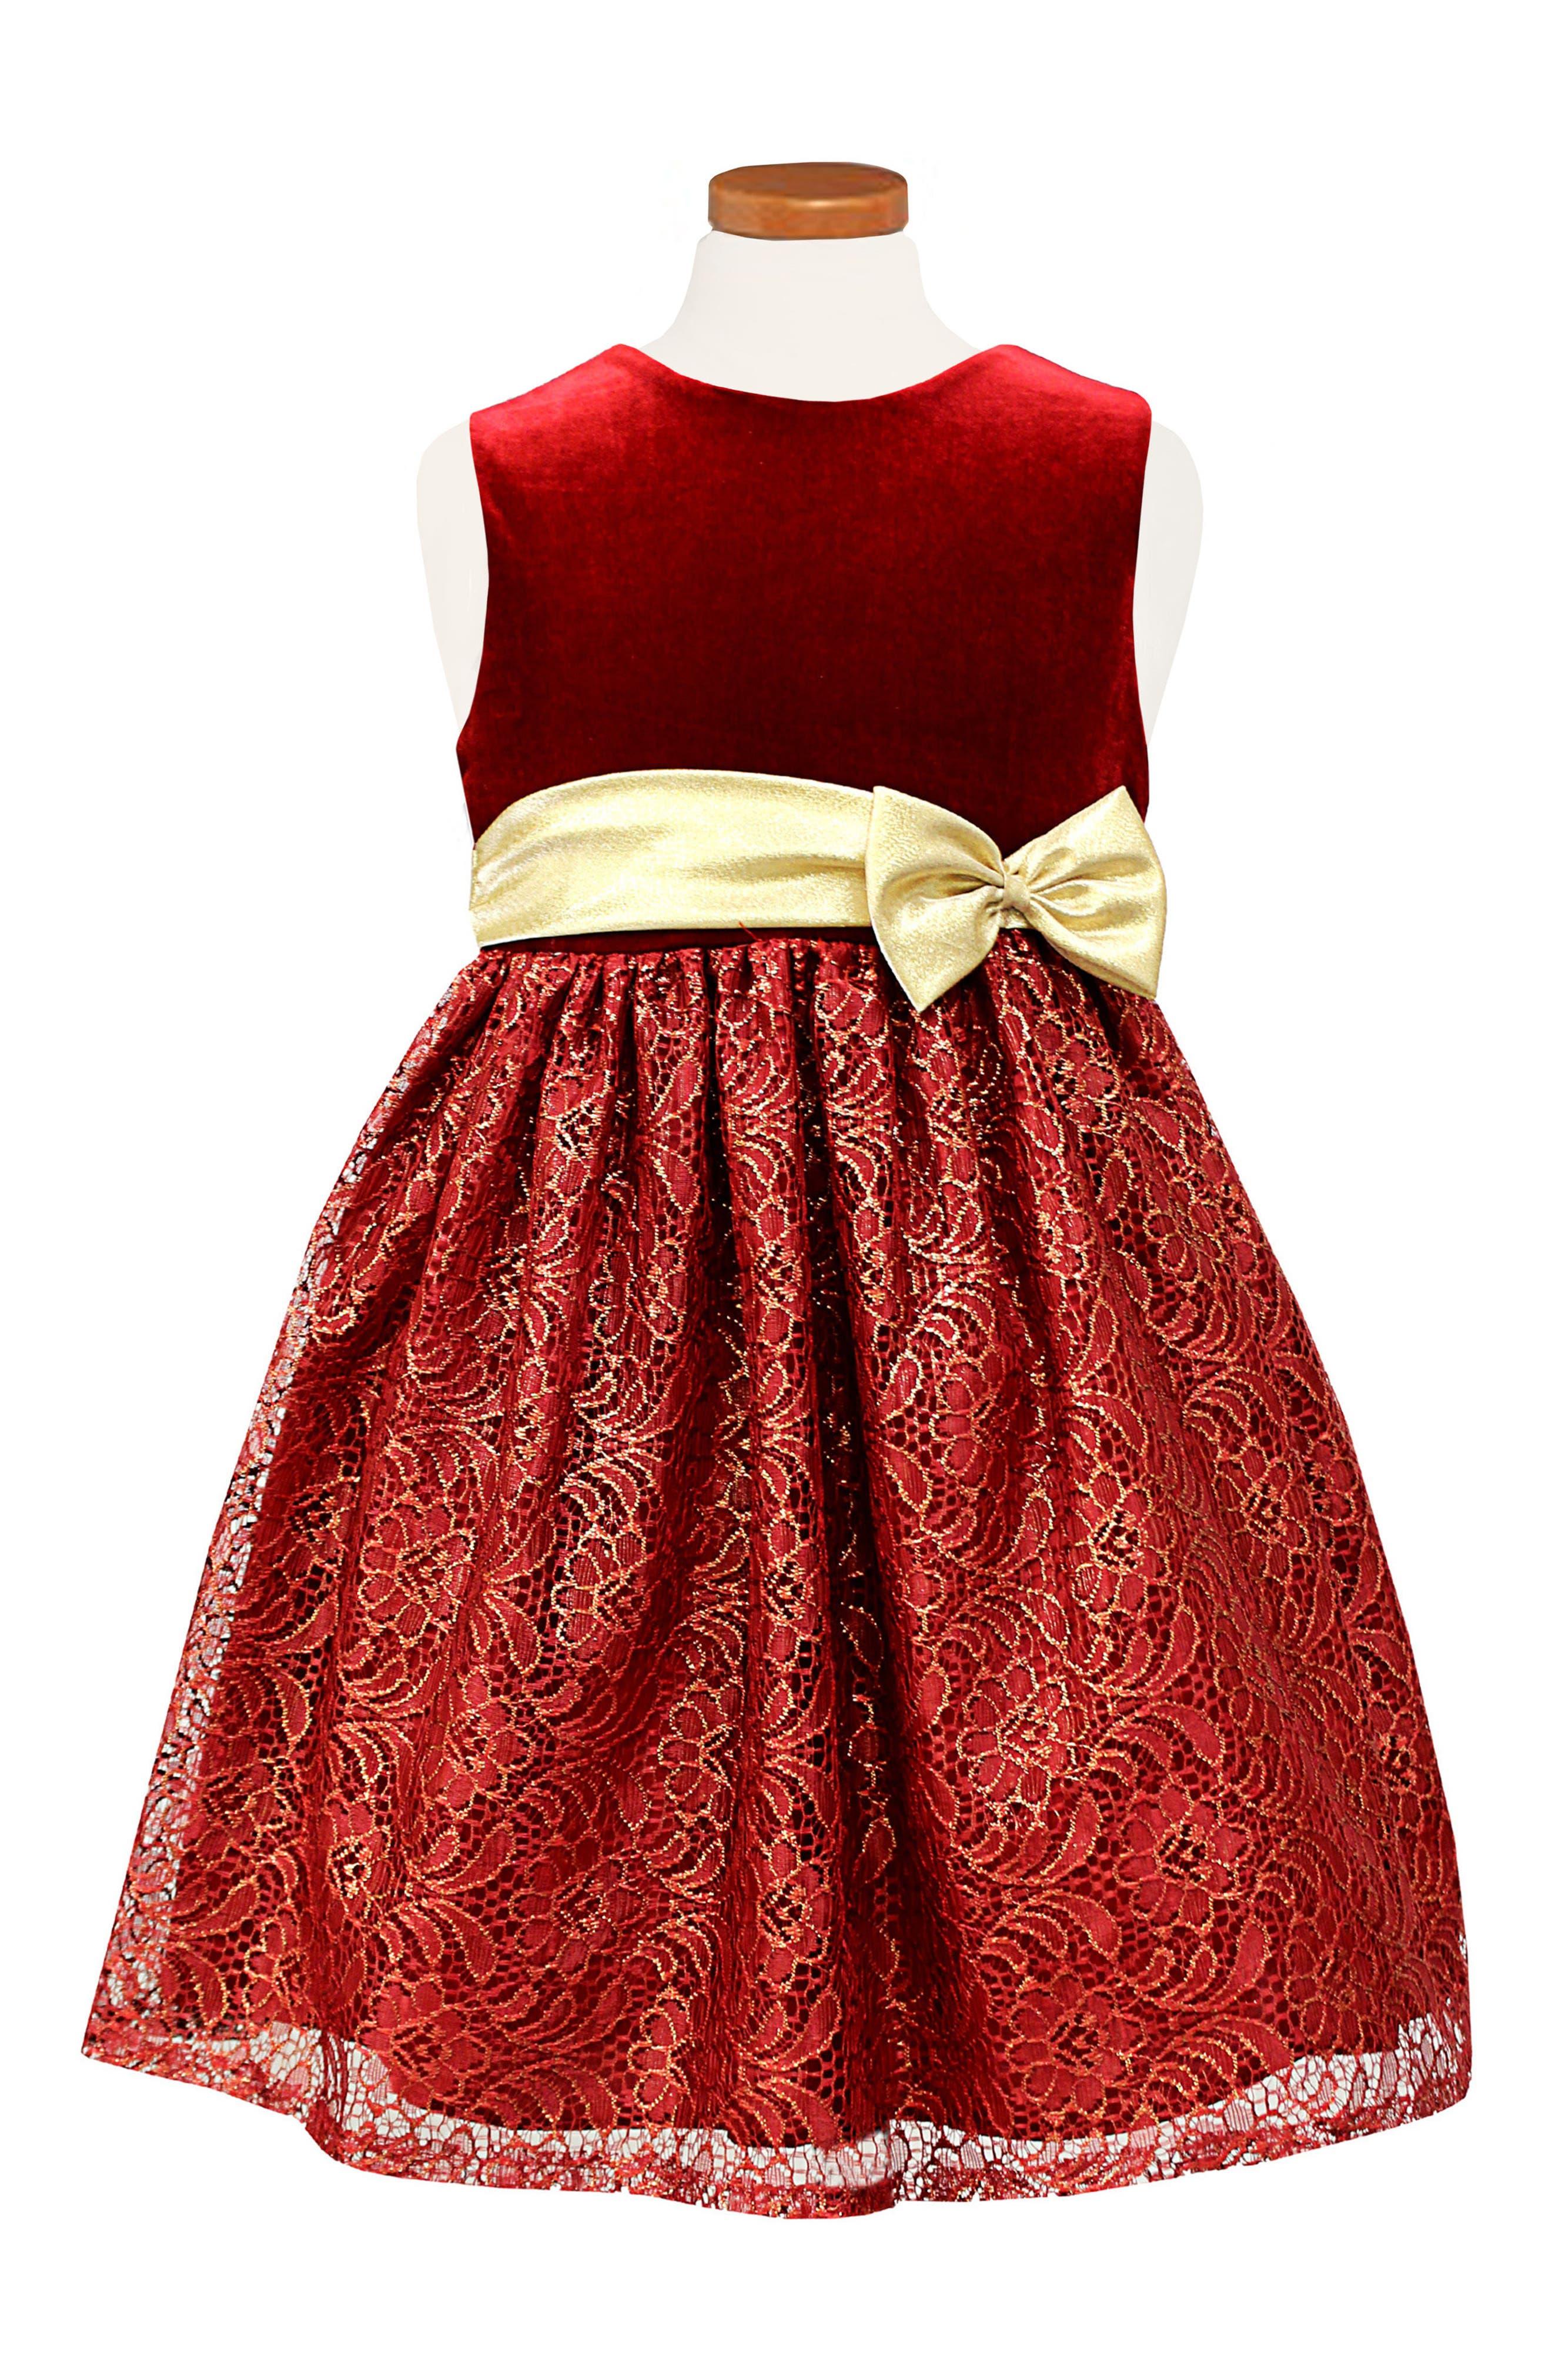 Velvet & Lace Party Dress,                         Main,                         color, Red